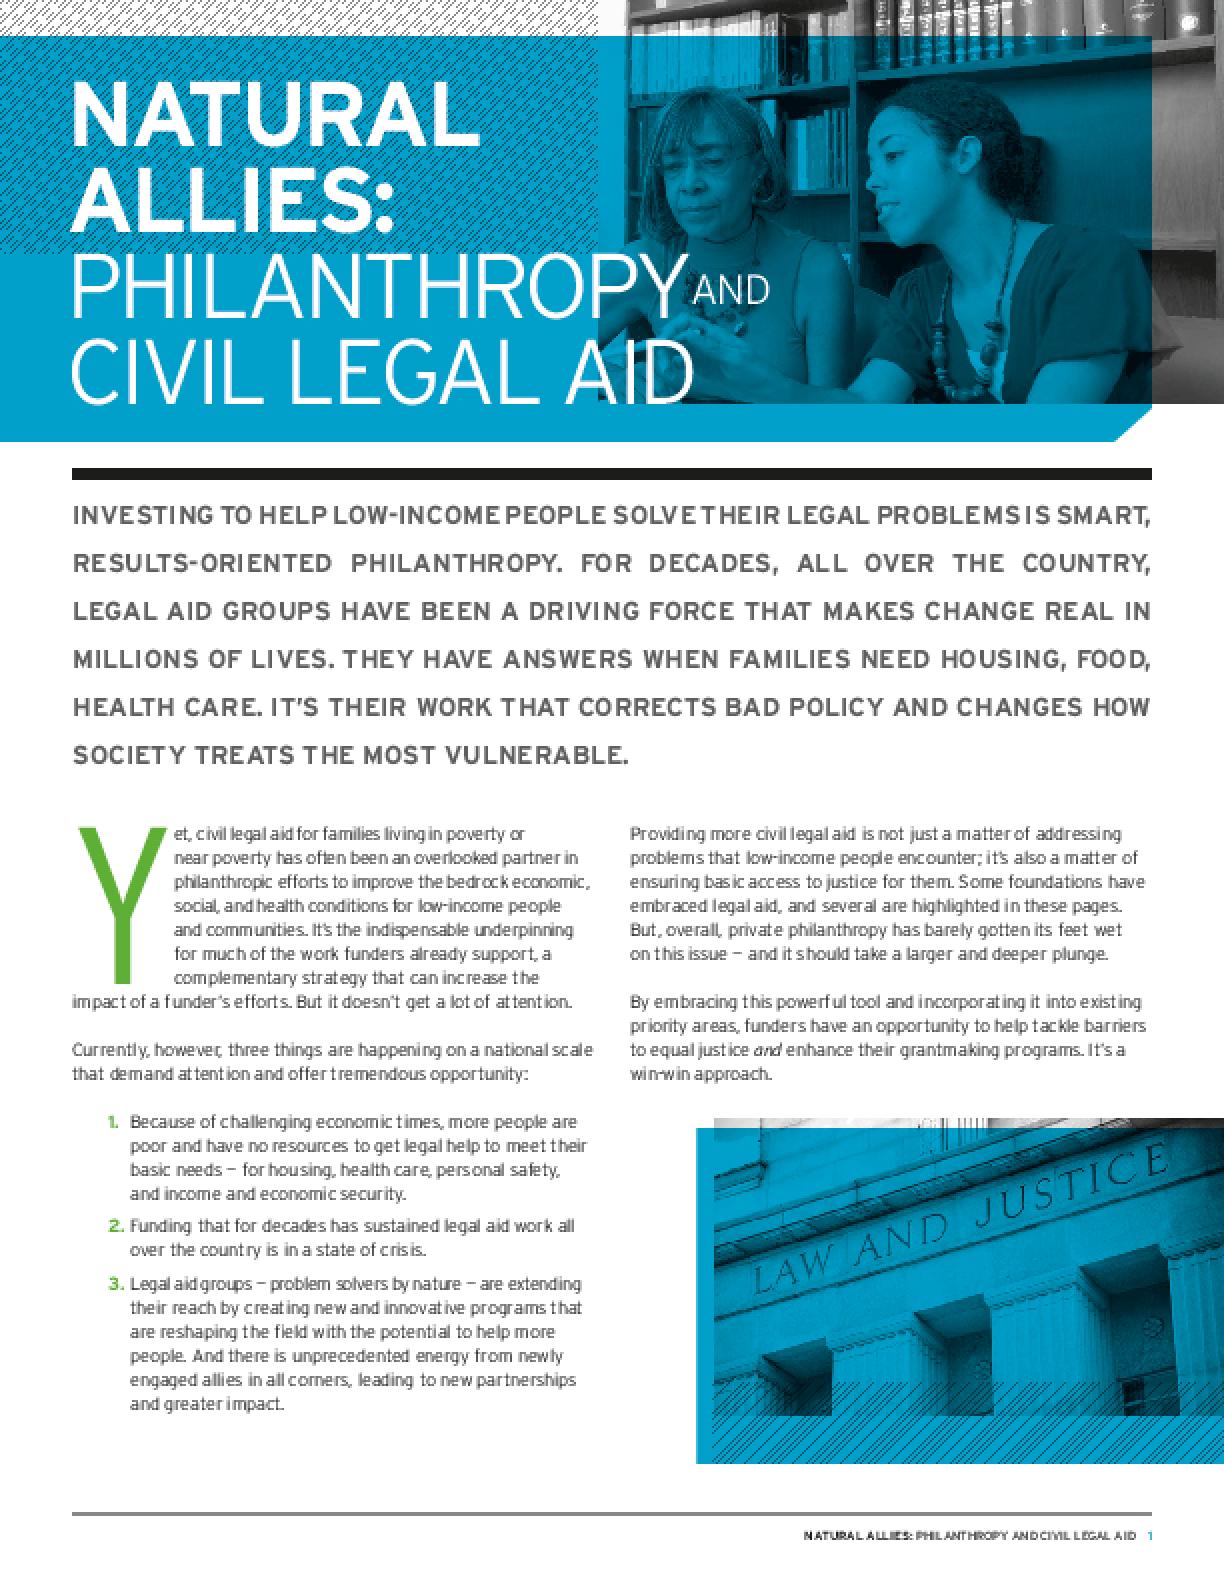 Natural Allies: Philanthropy and Civil Legal Aid